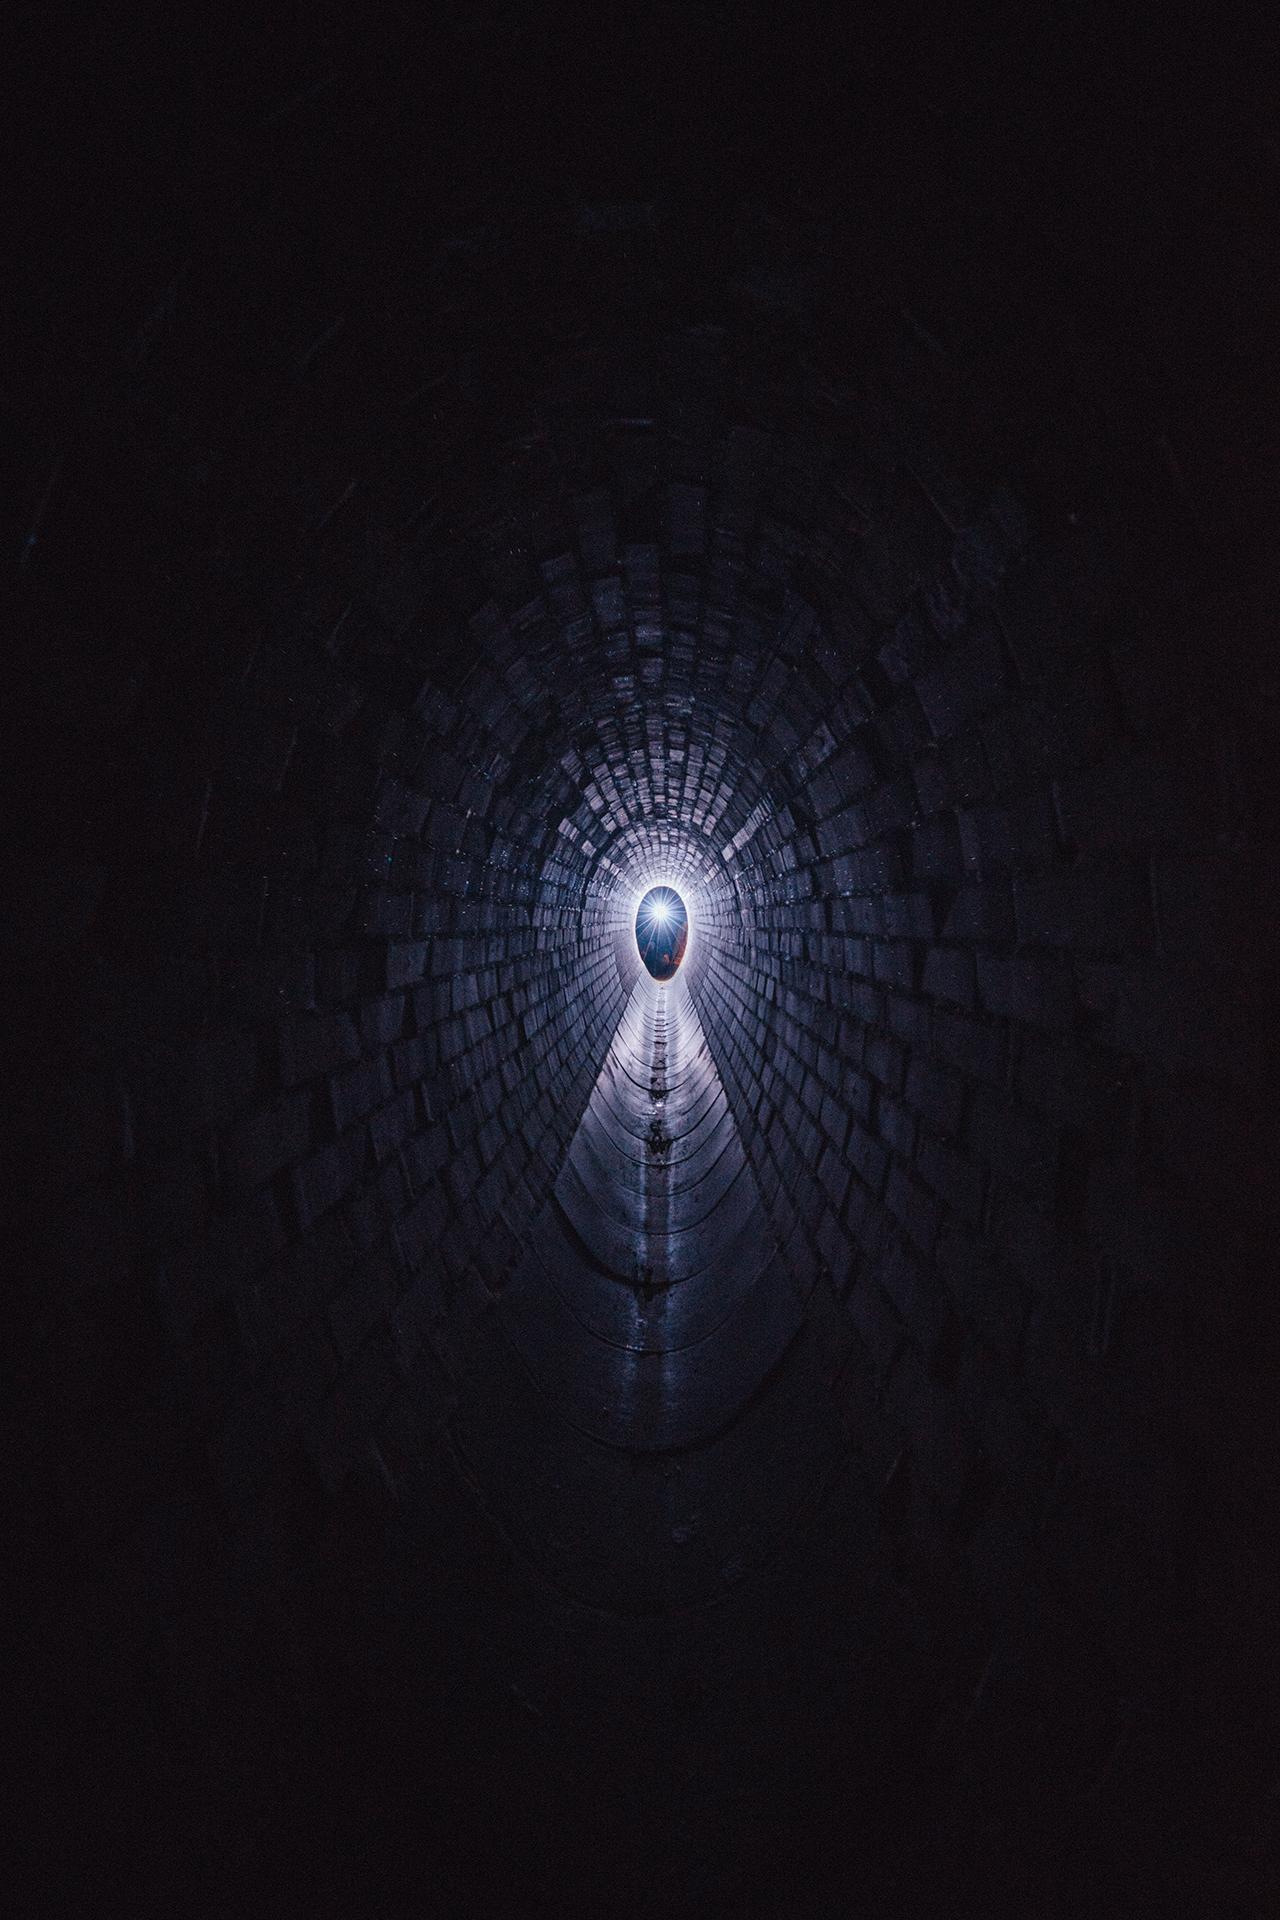 kanál, Barrandov, Praha, podzemí 1